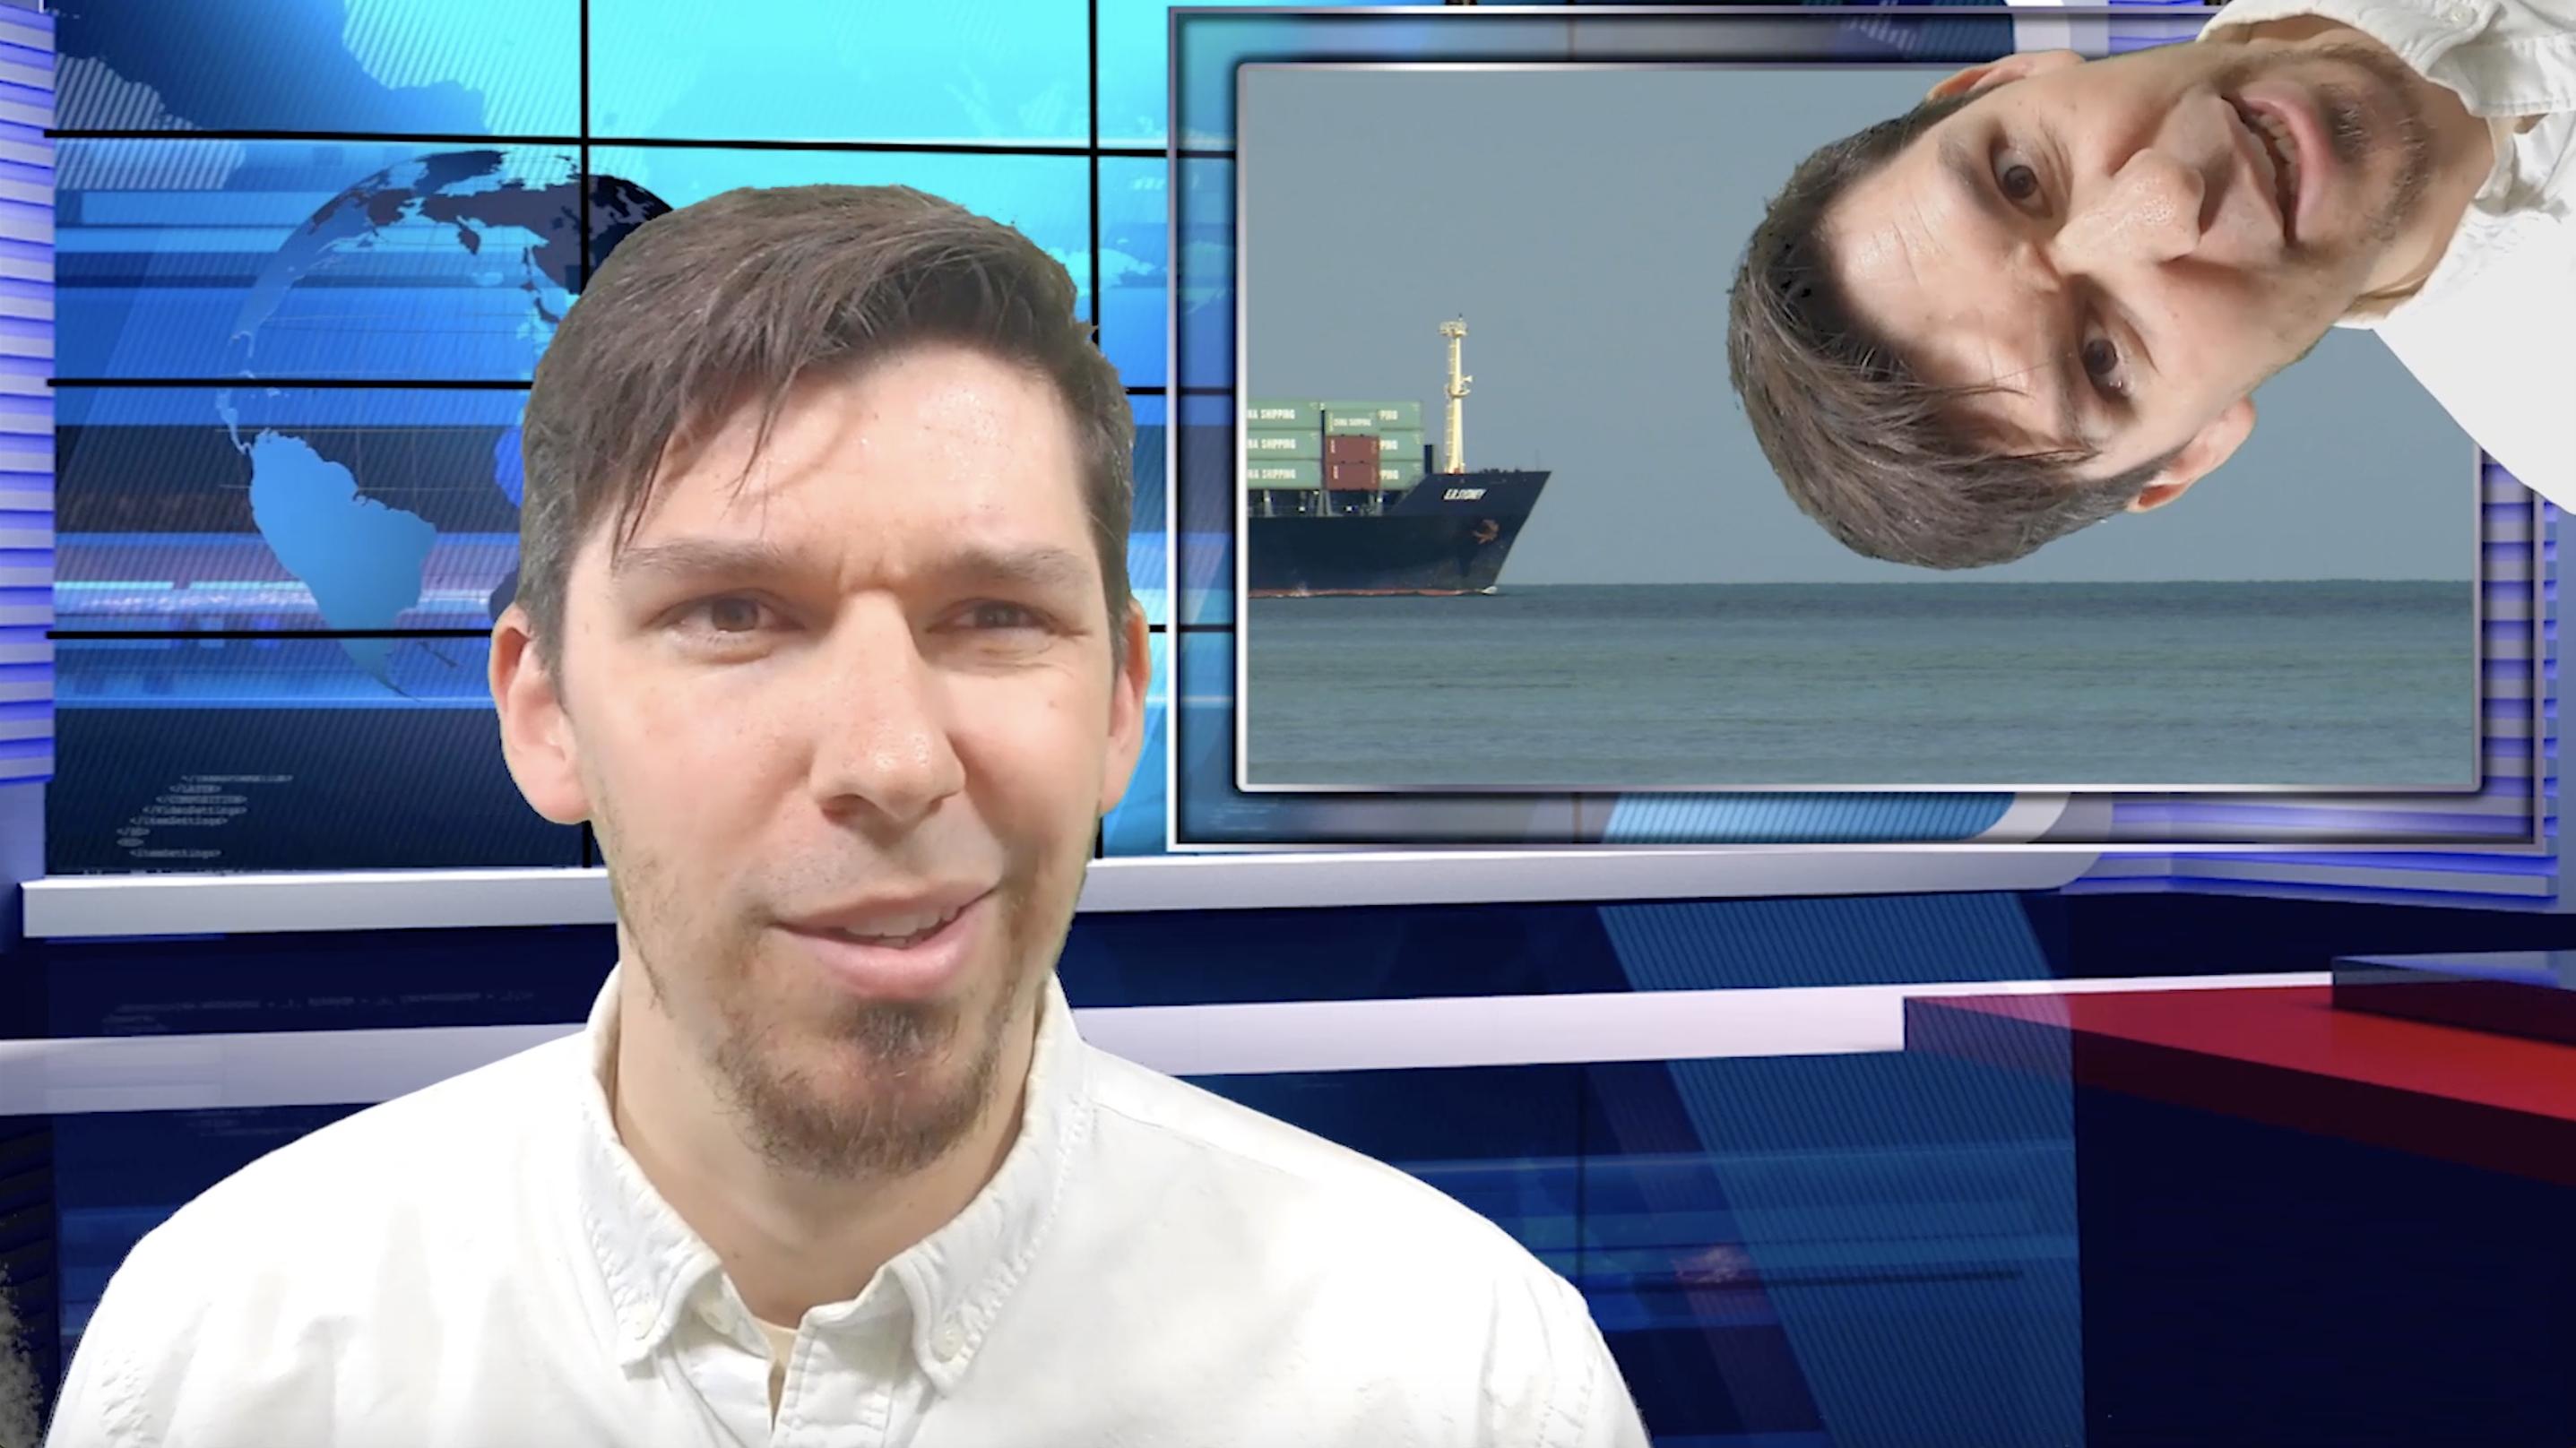 transhipment universal shipping news